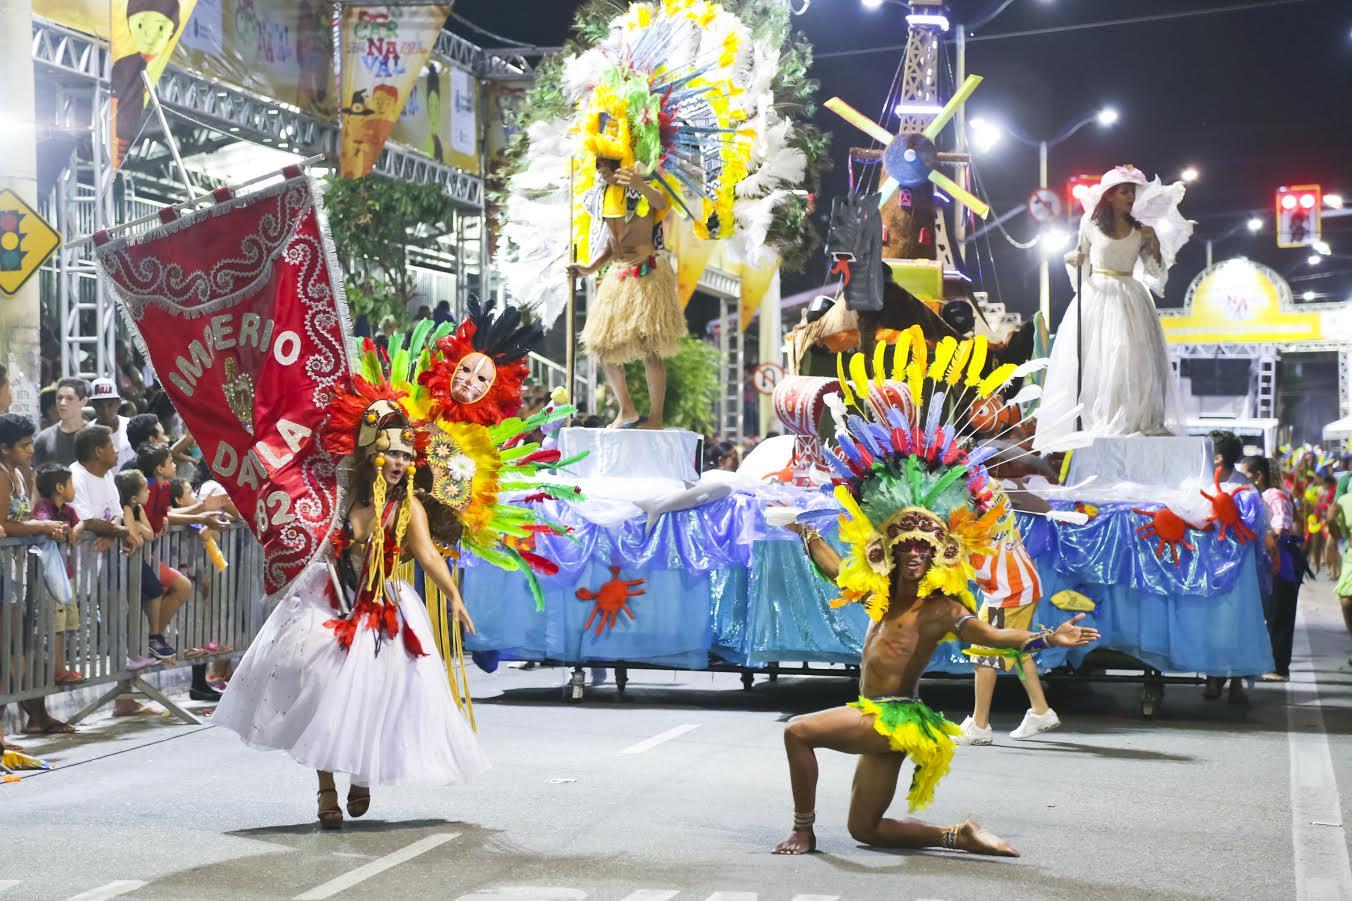 Carnaval deve injetar R$ 377 milhões na economia cearense